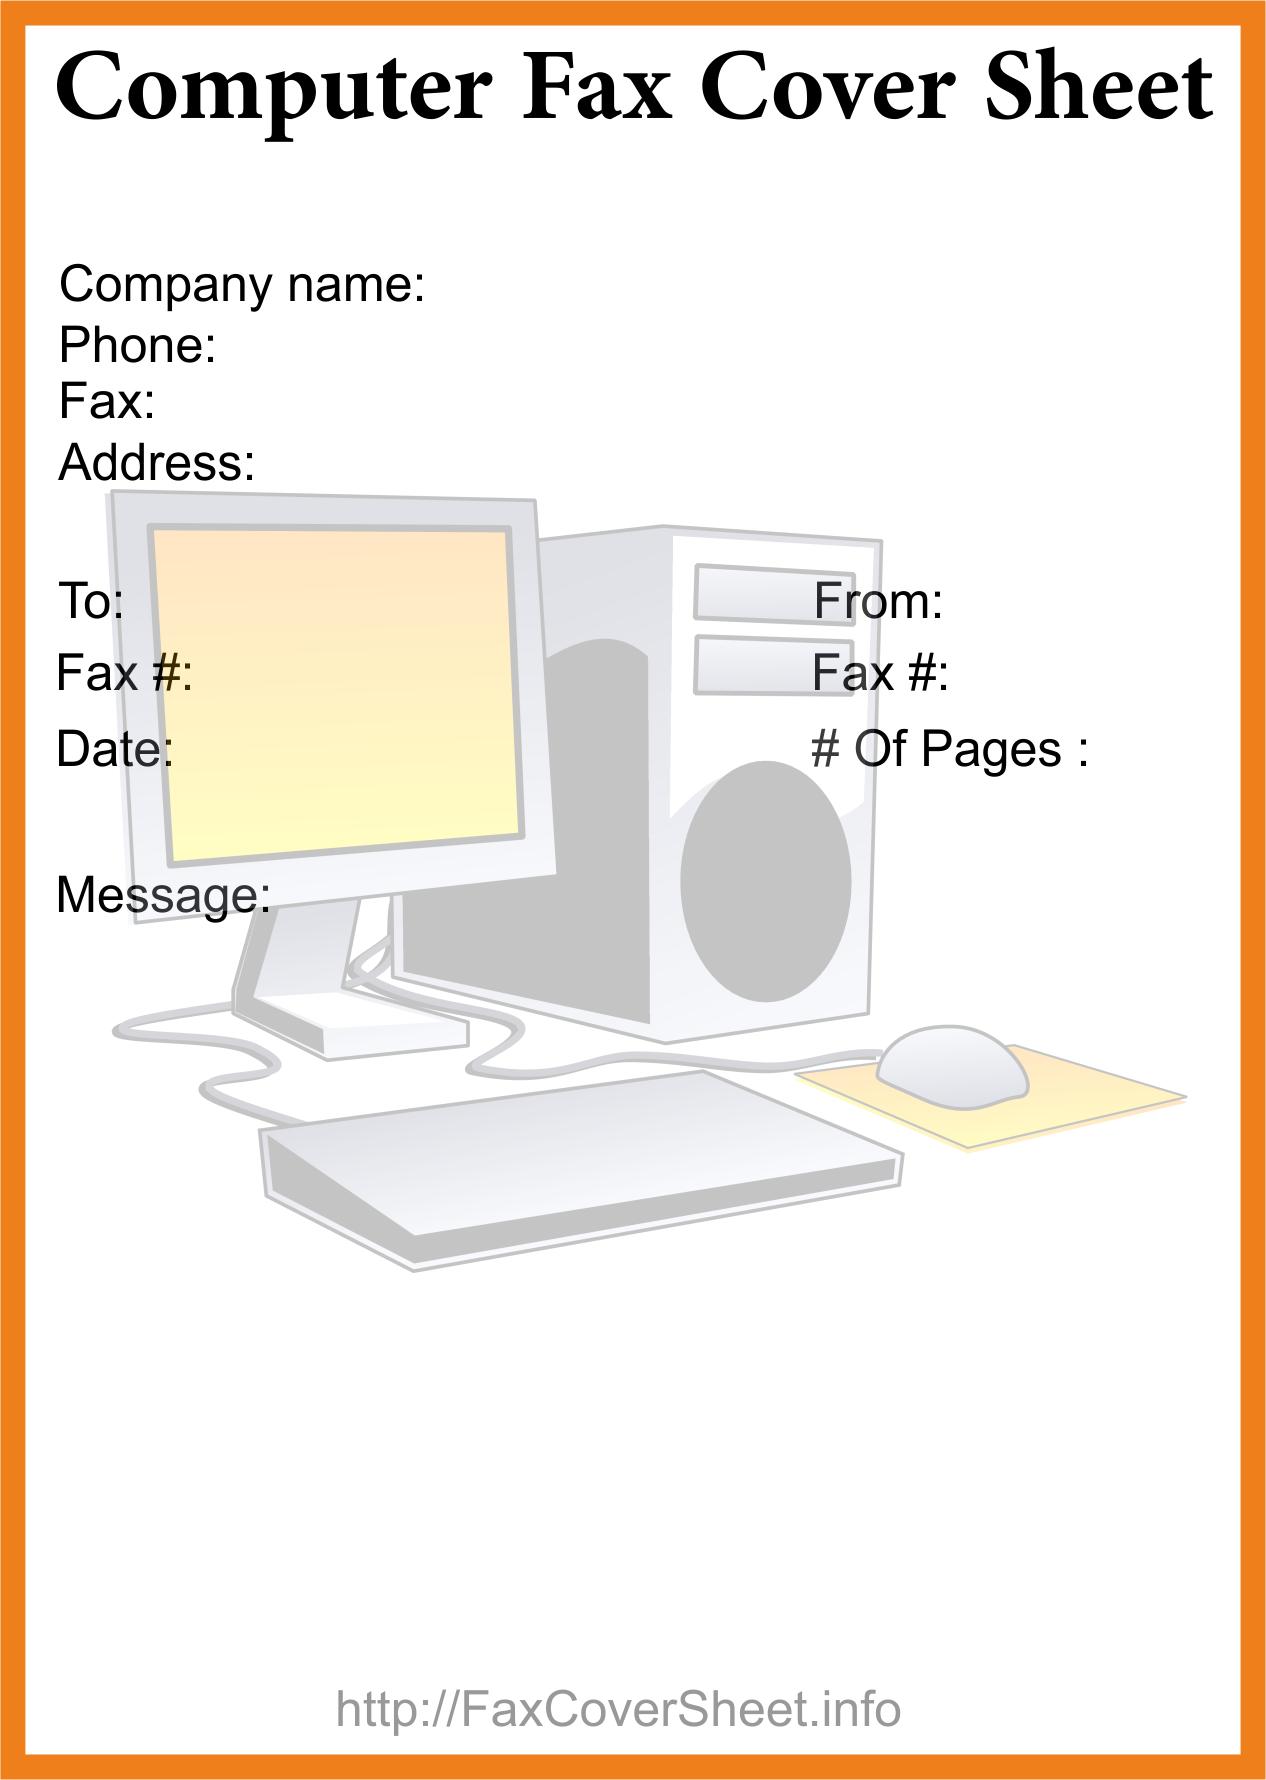 DownloadComputer Fax Cover Sheet Template